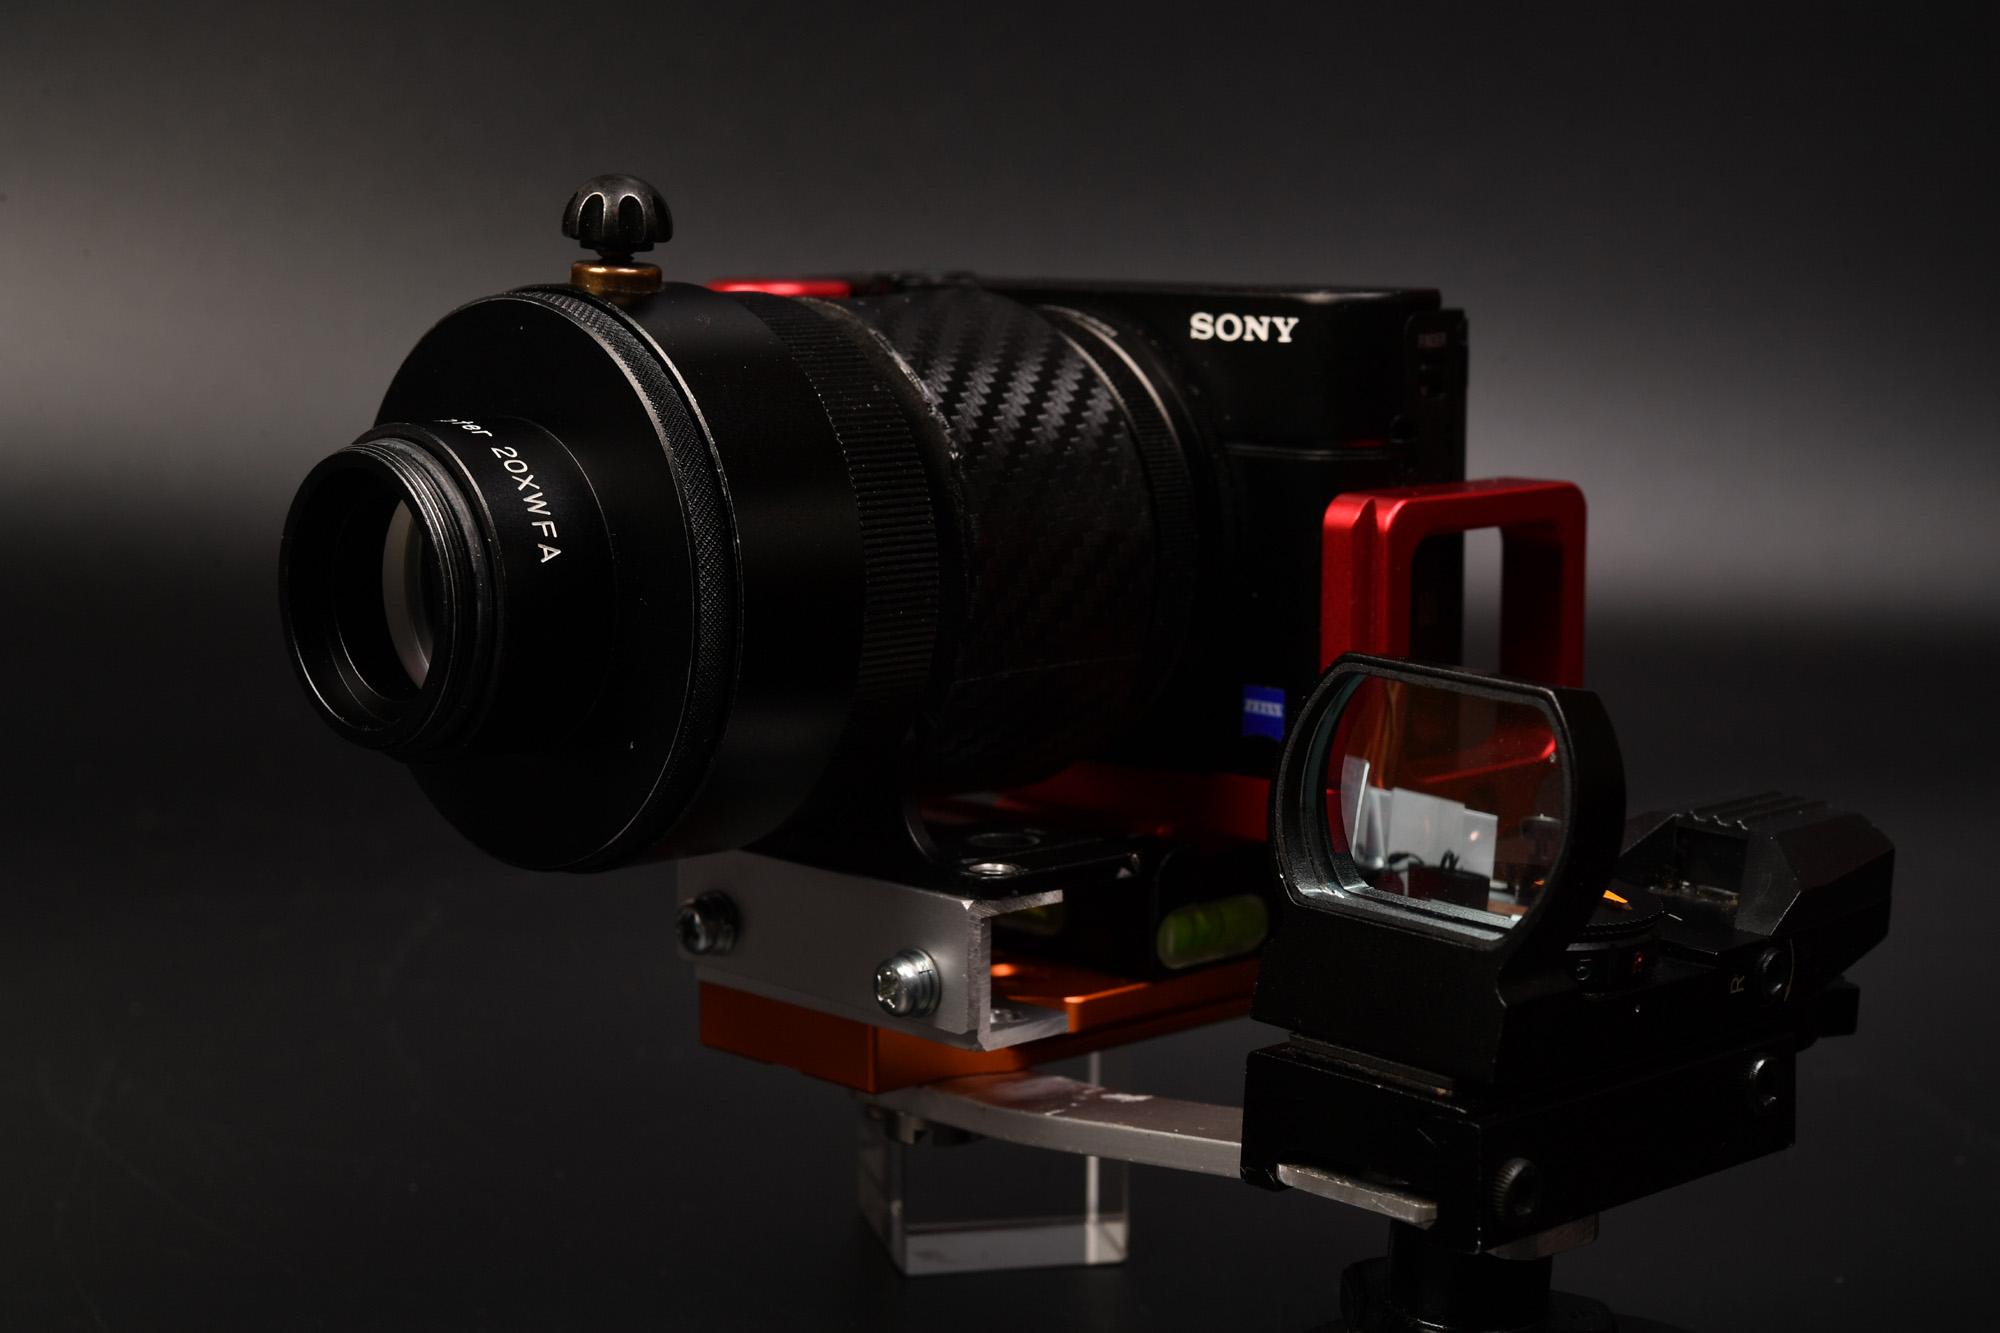 SONY RX100M3 カメラブラケット自作 その2 DIGISCO.COM Tubro Adapter 20XWFA 再購入